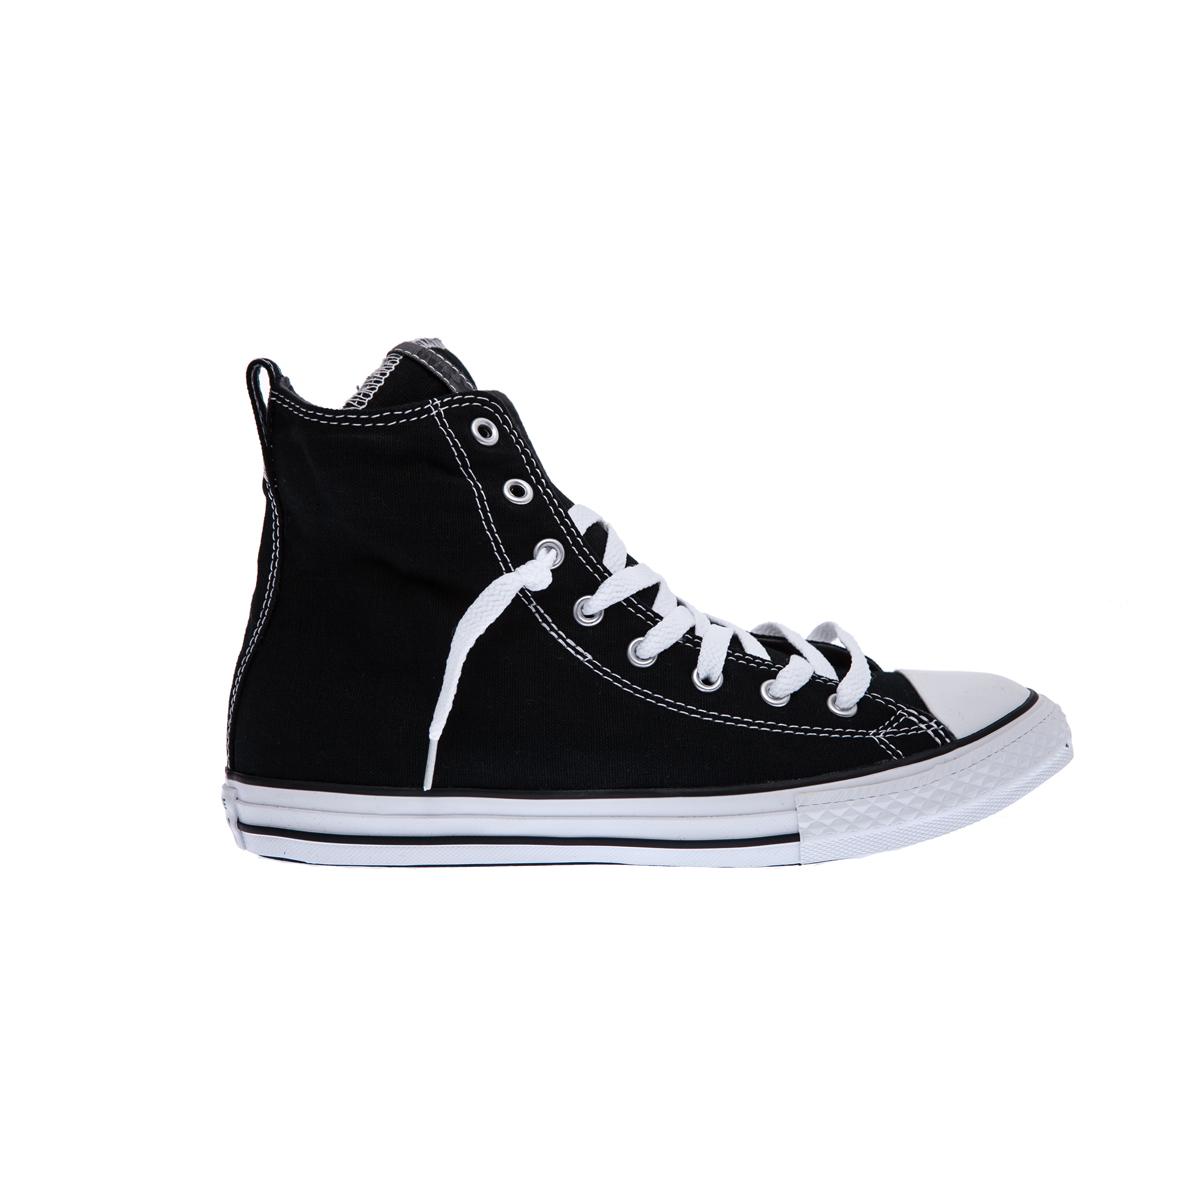 CONVERSE - Παιδικά παπούτσια Chuck Taylor All Star Slip It μαύρα 71293cb5b8b